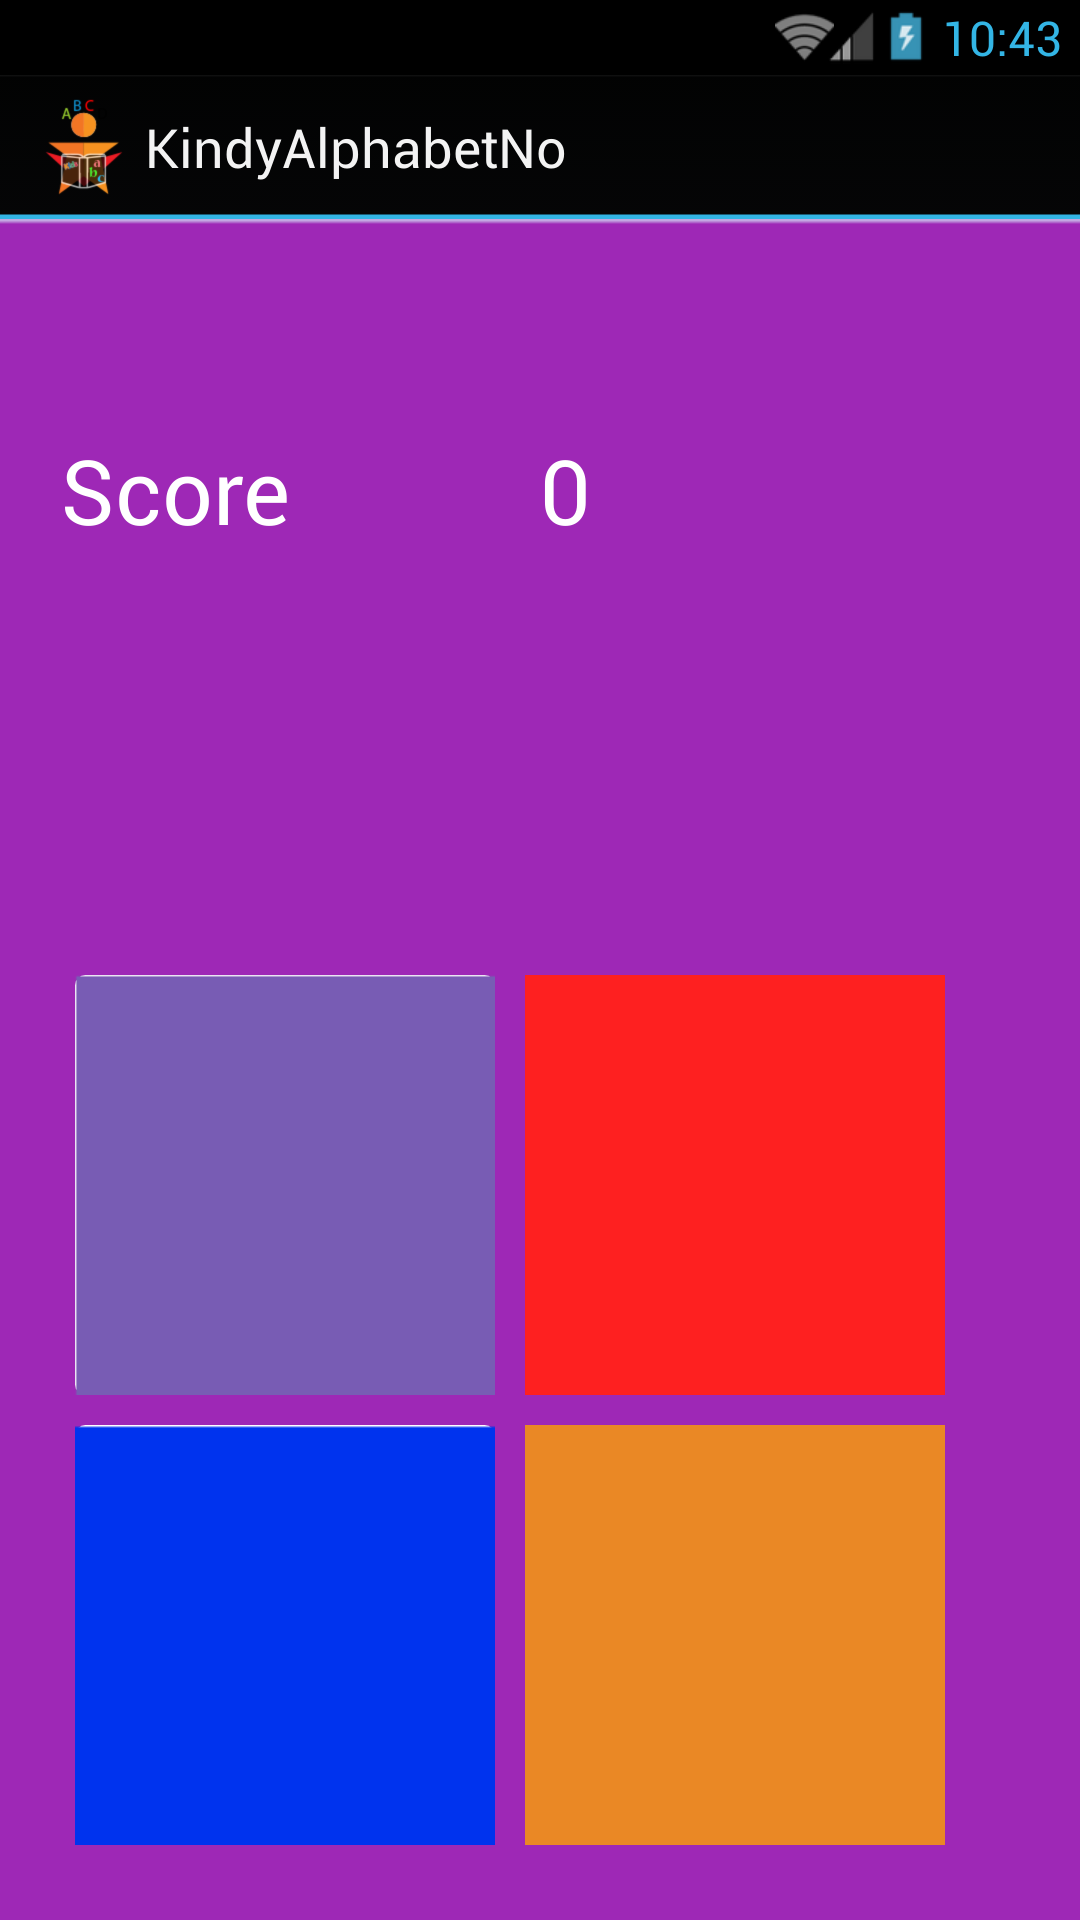 color game @ KindyAlphabetNo app | KindyAlphabetNo | Pinterest ...